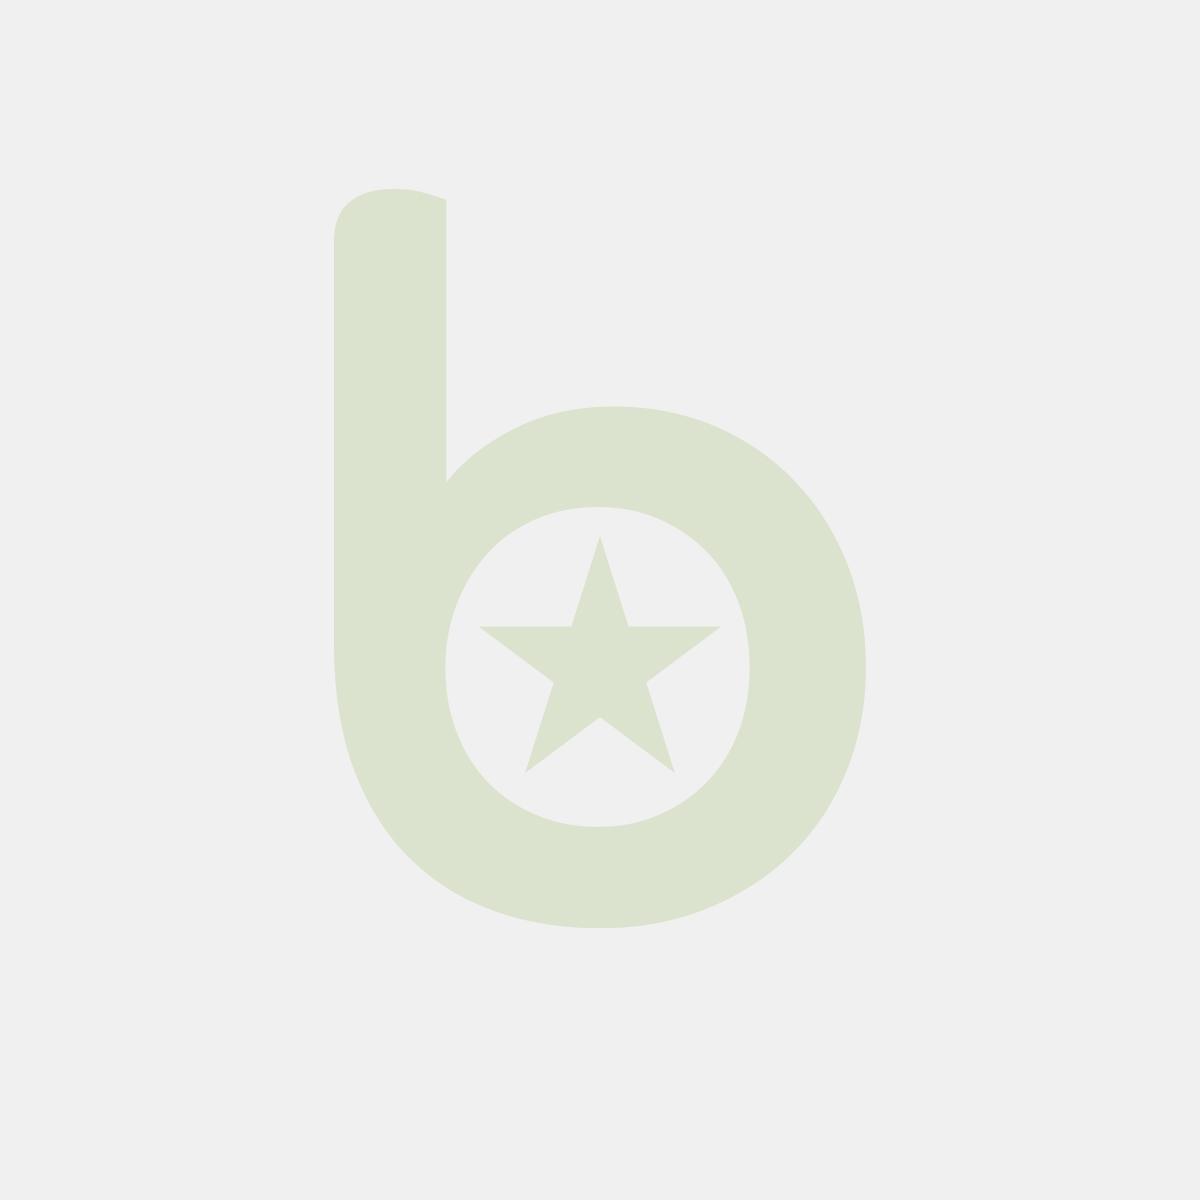 Fartuch do grillowania - kod 556696